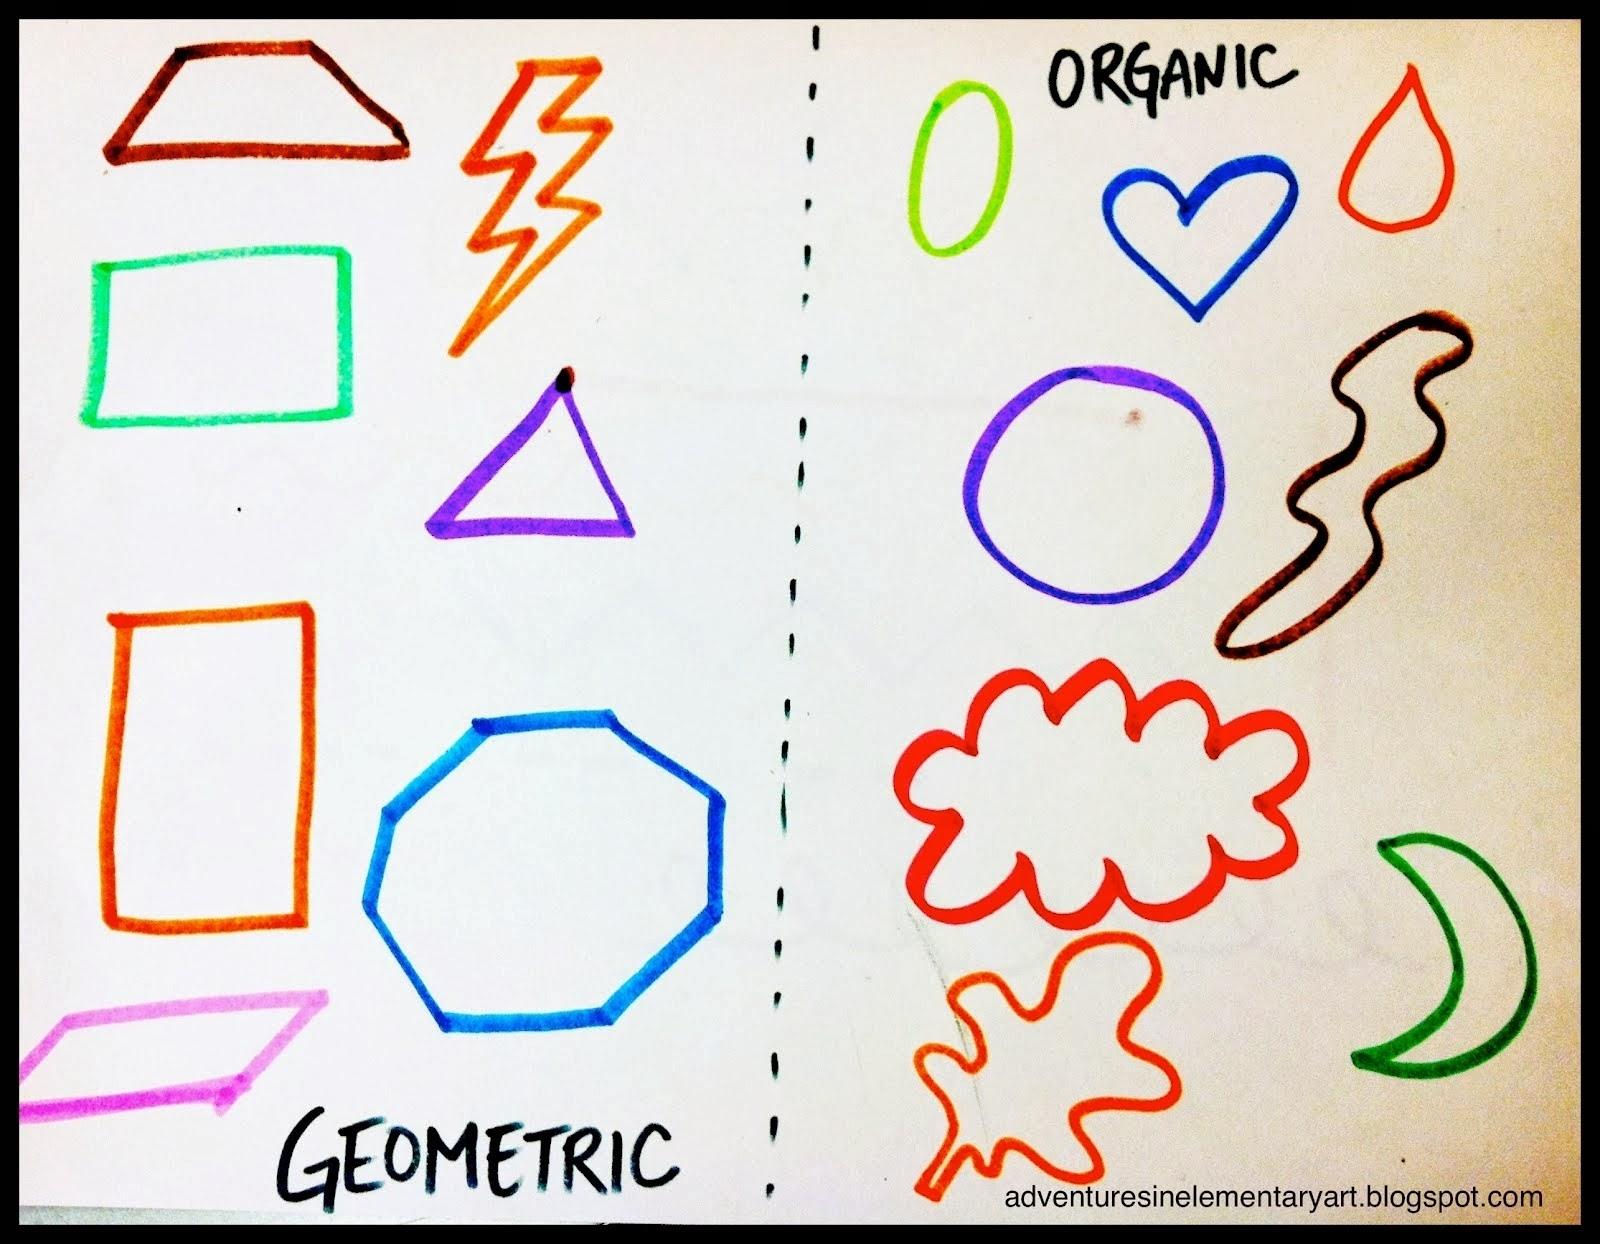 Organic shapes photo